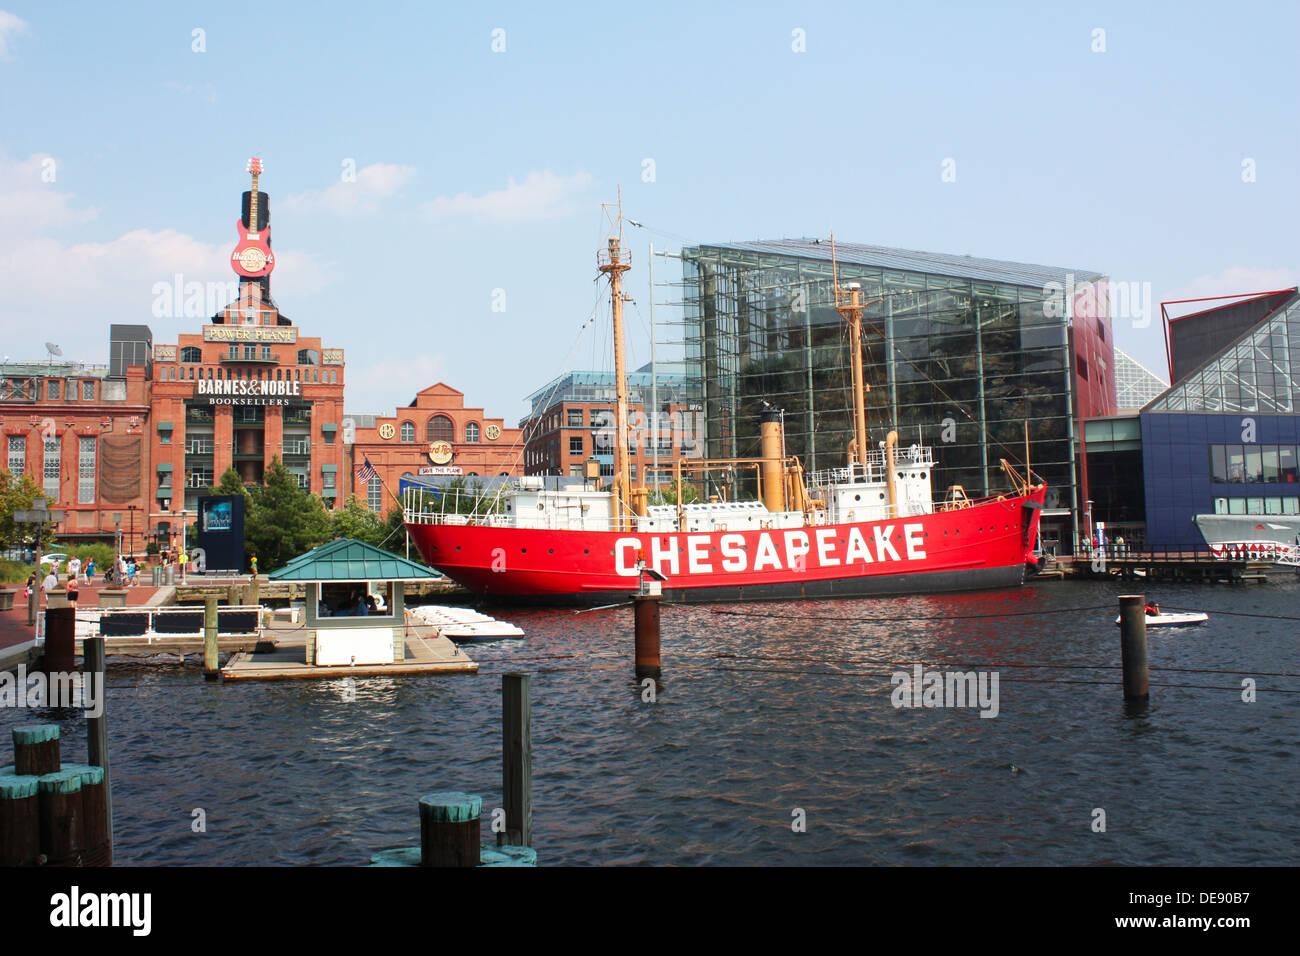 Red Chesapeake ship in Baltimore, Maryland, USA Stock Photo